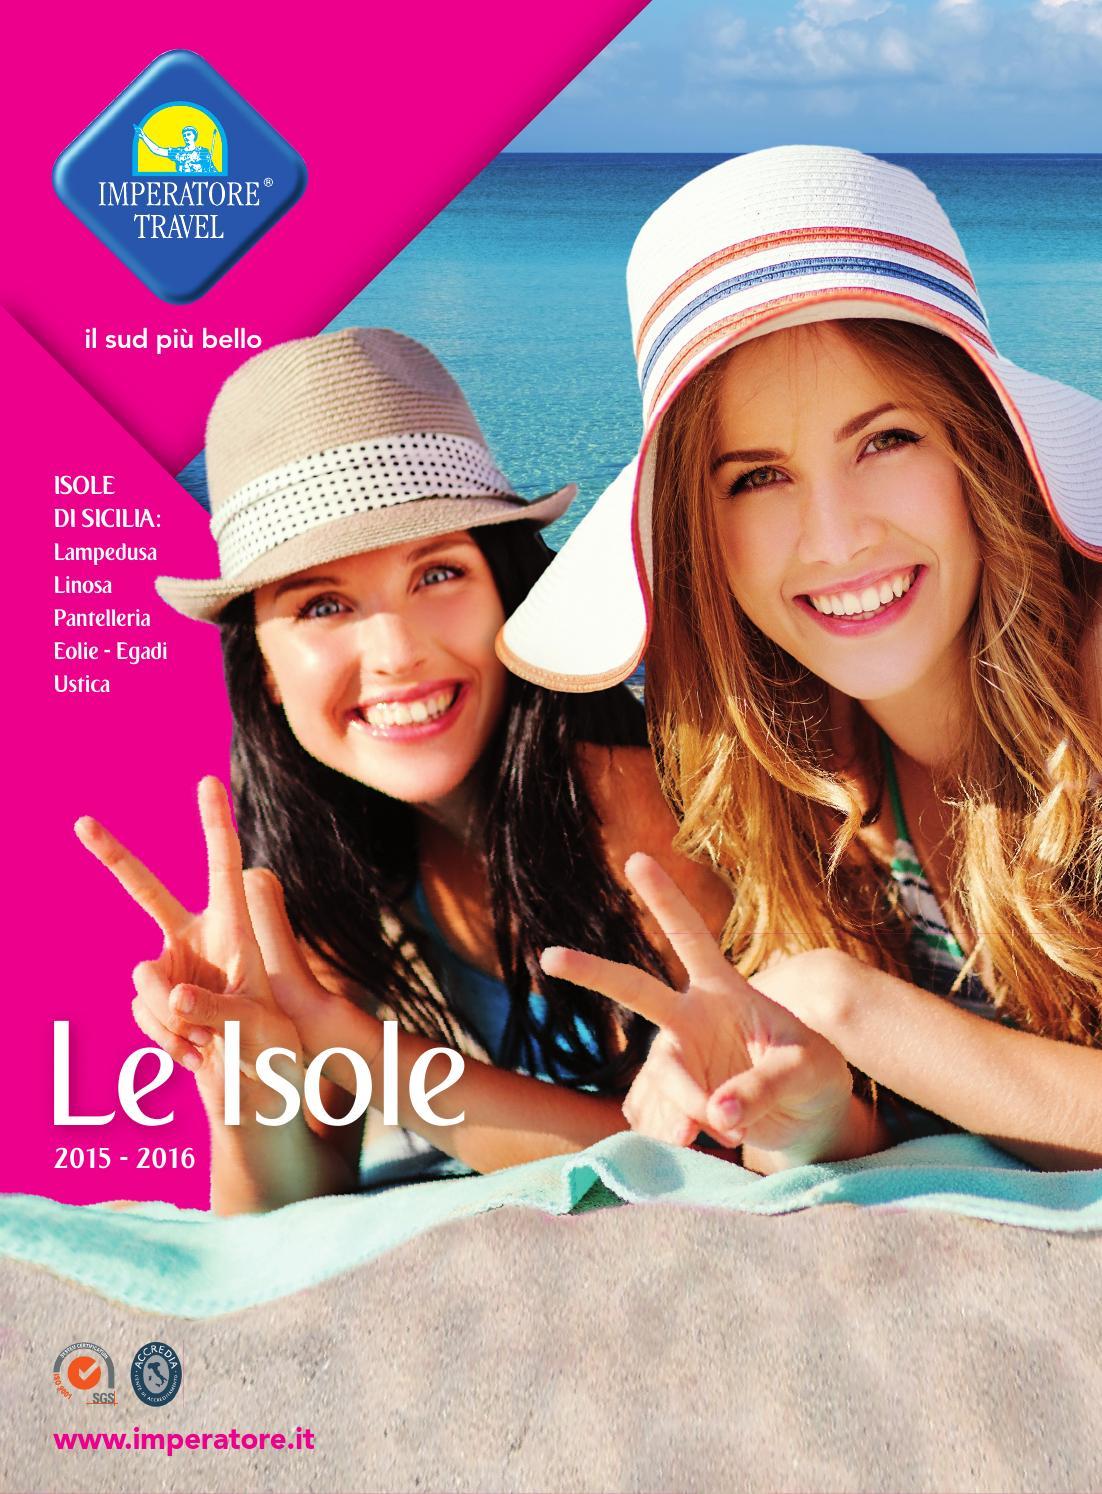 Catalogo le isole 2015 imperatore travel by Imperatore Travel - issuu